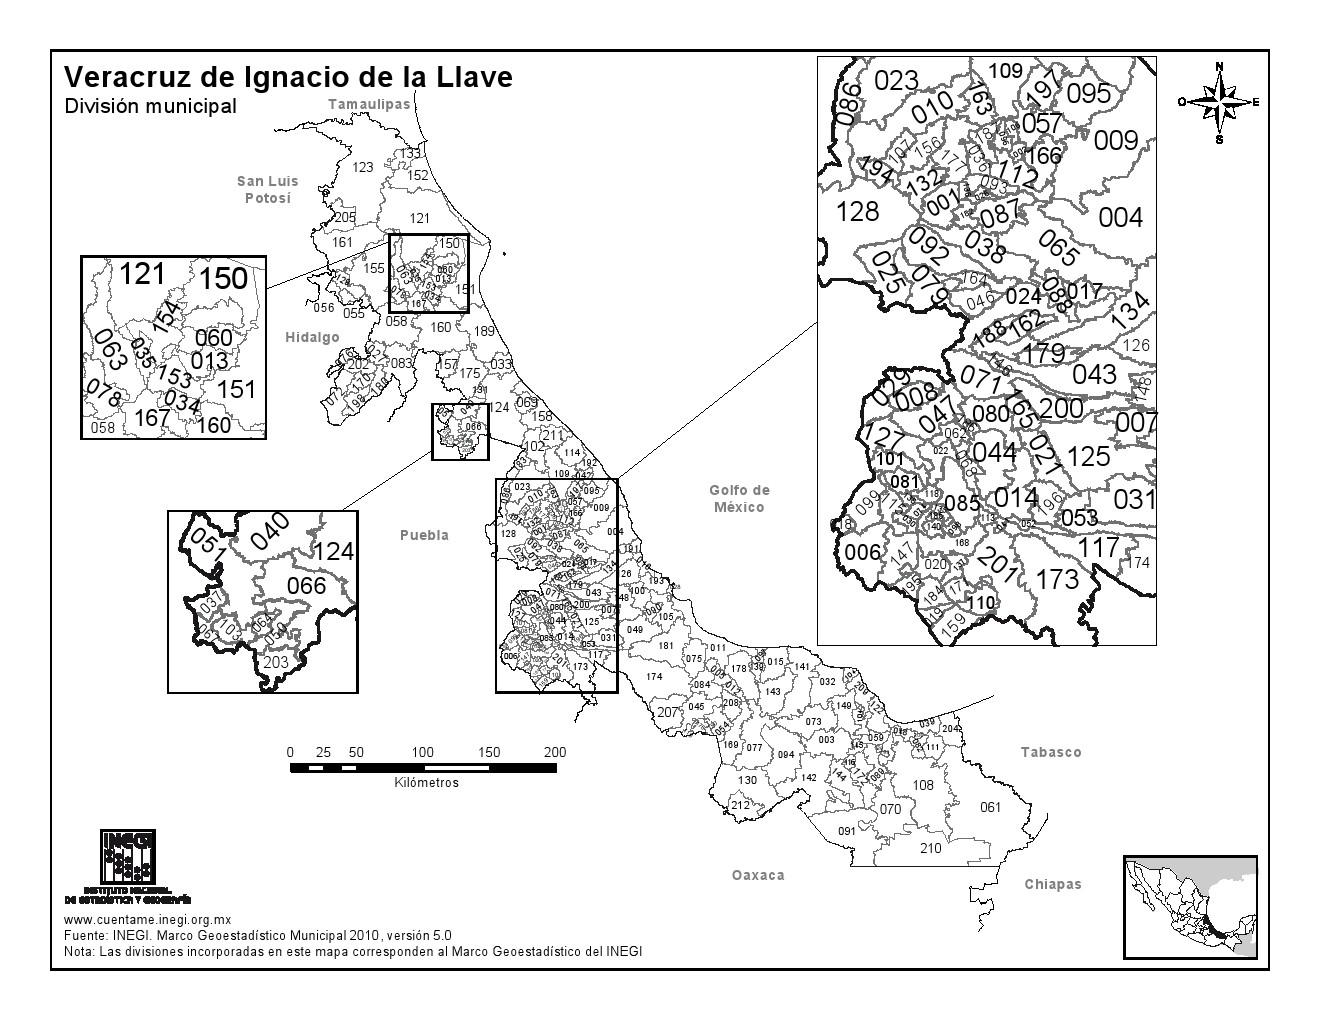 Mapa de municipios de Veracruz. INEGI de México